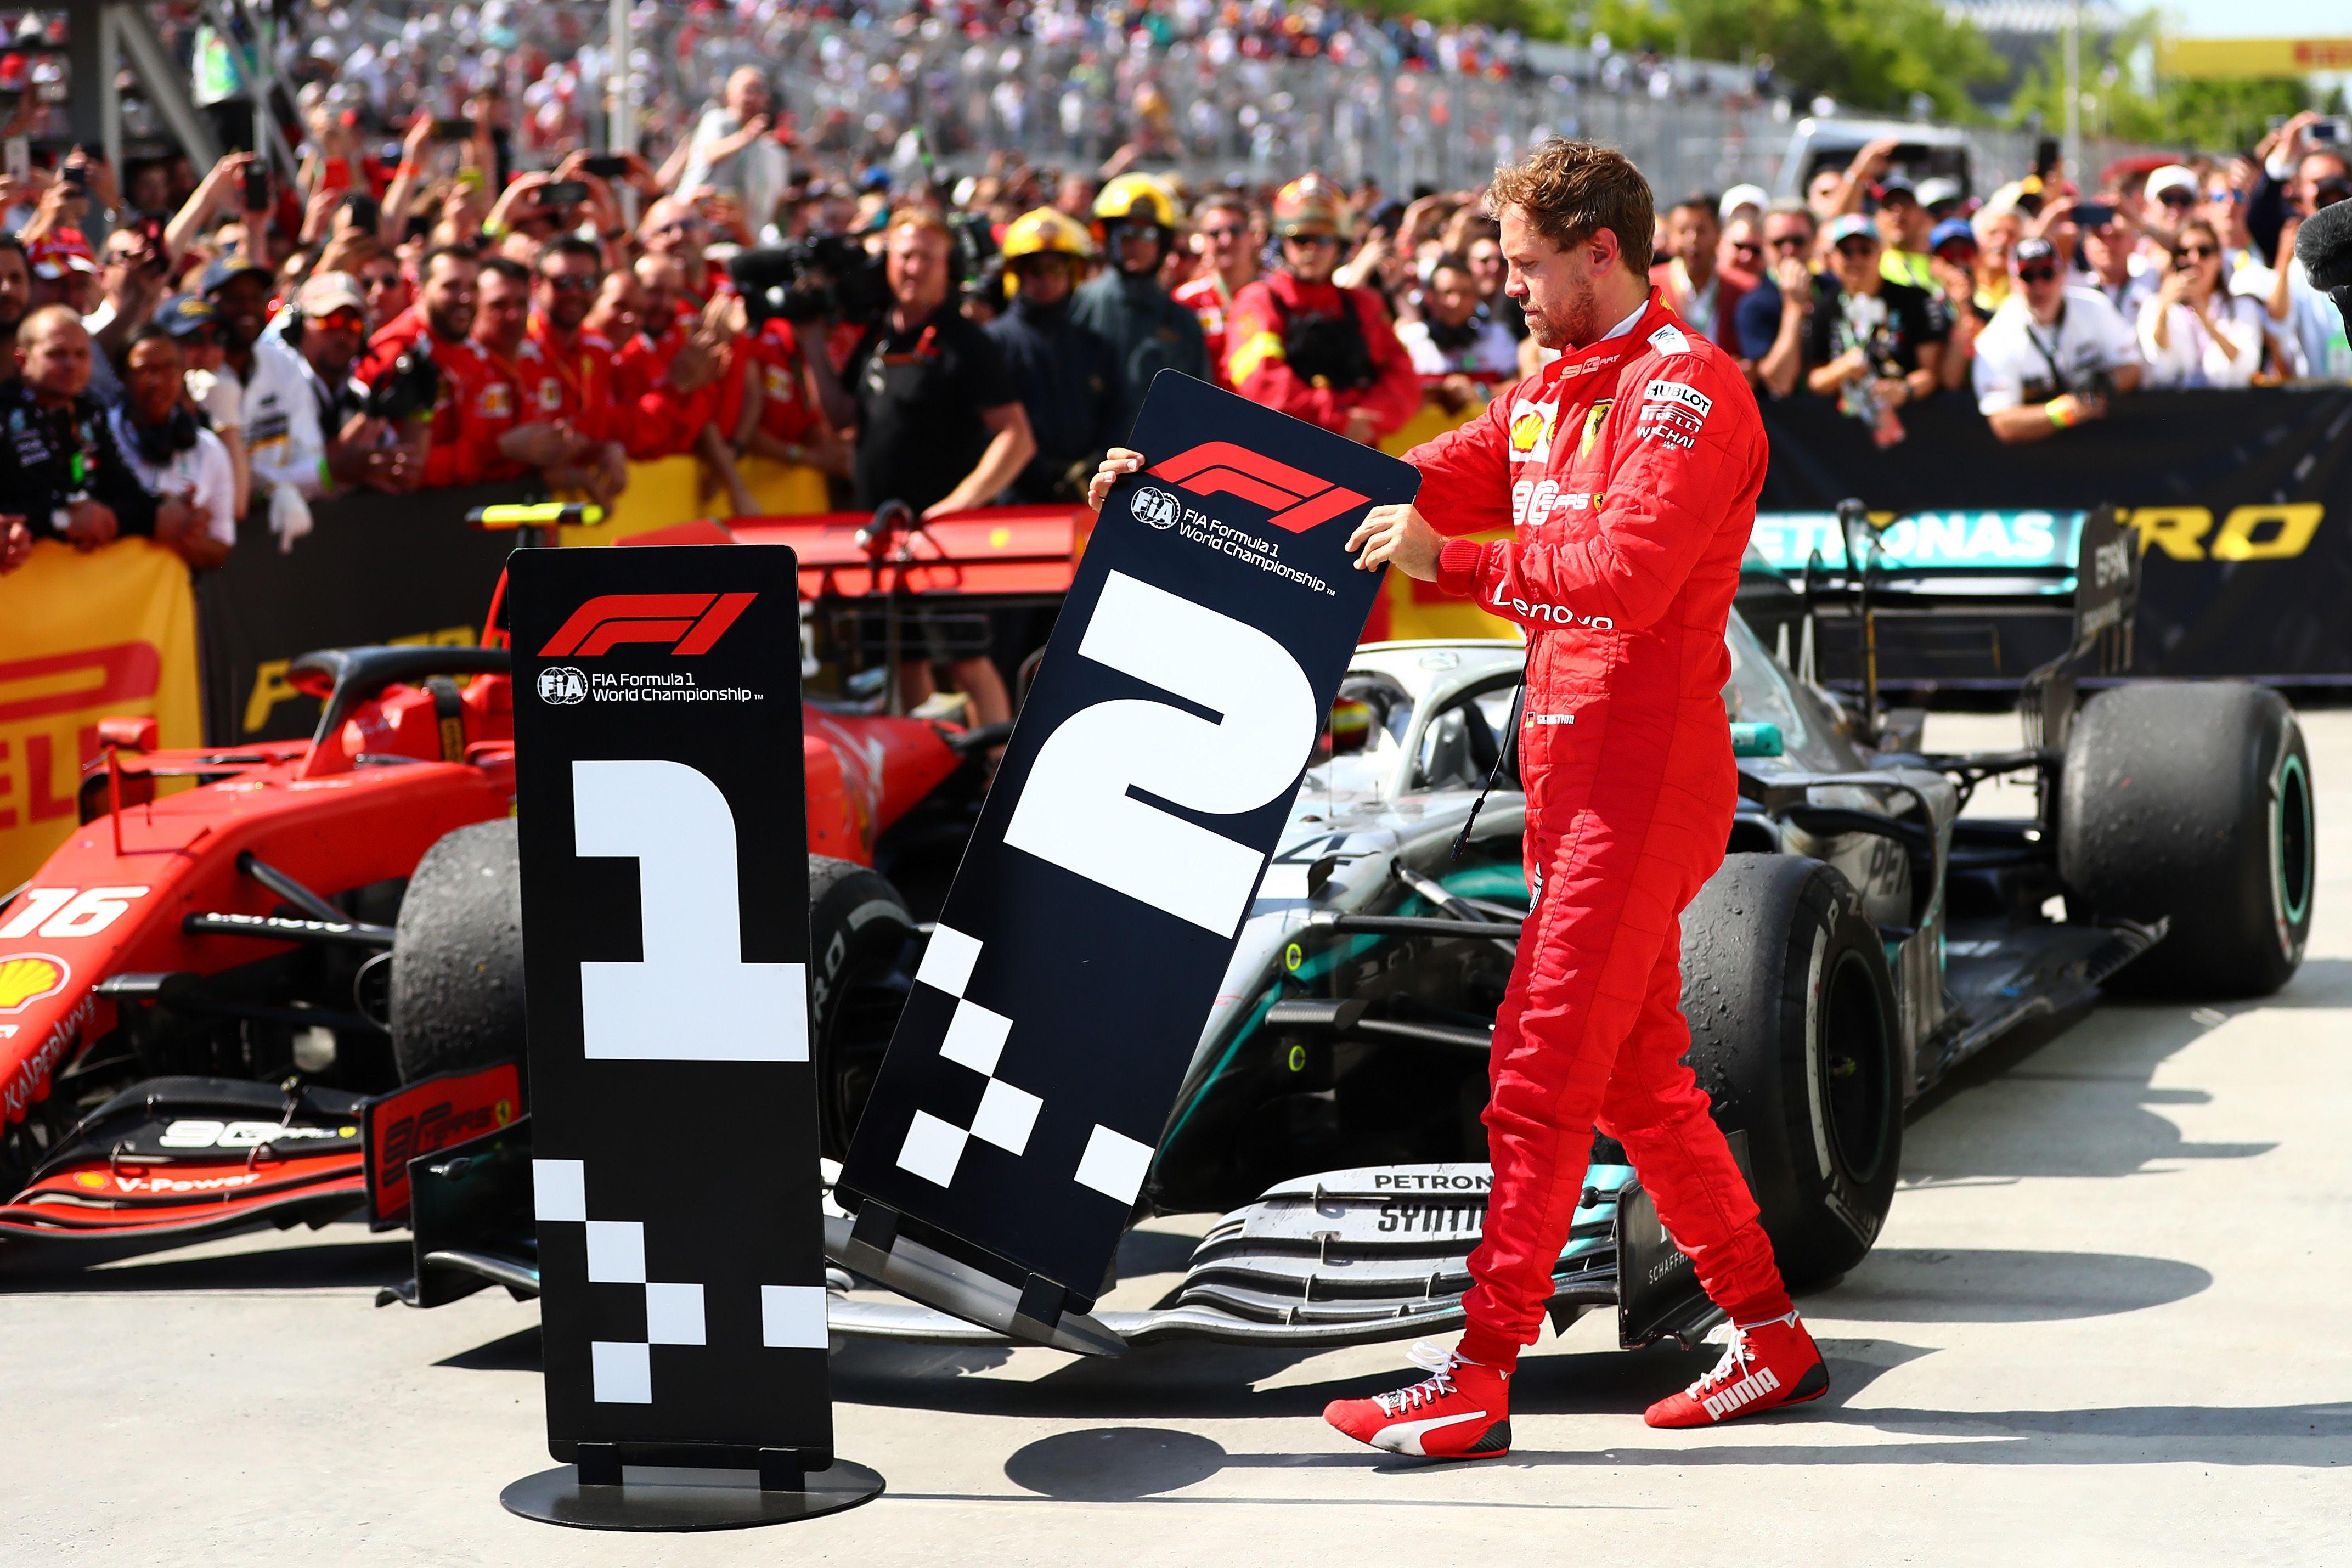 Vettel swaps his sign with Hamilton's